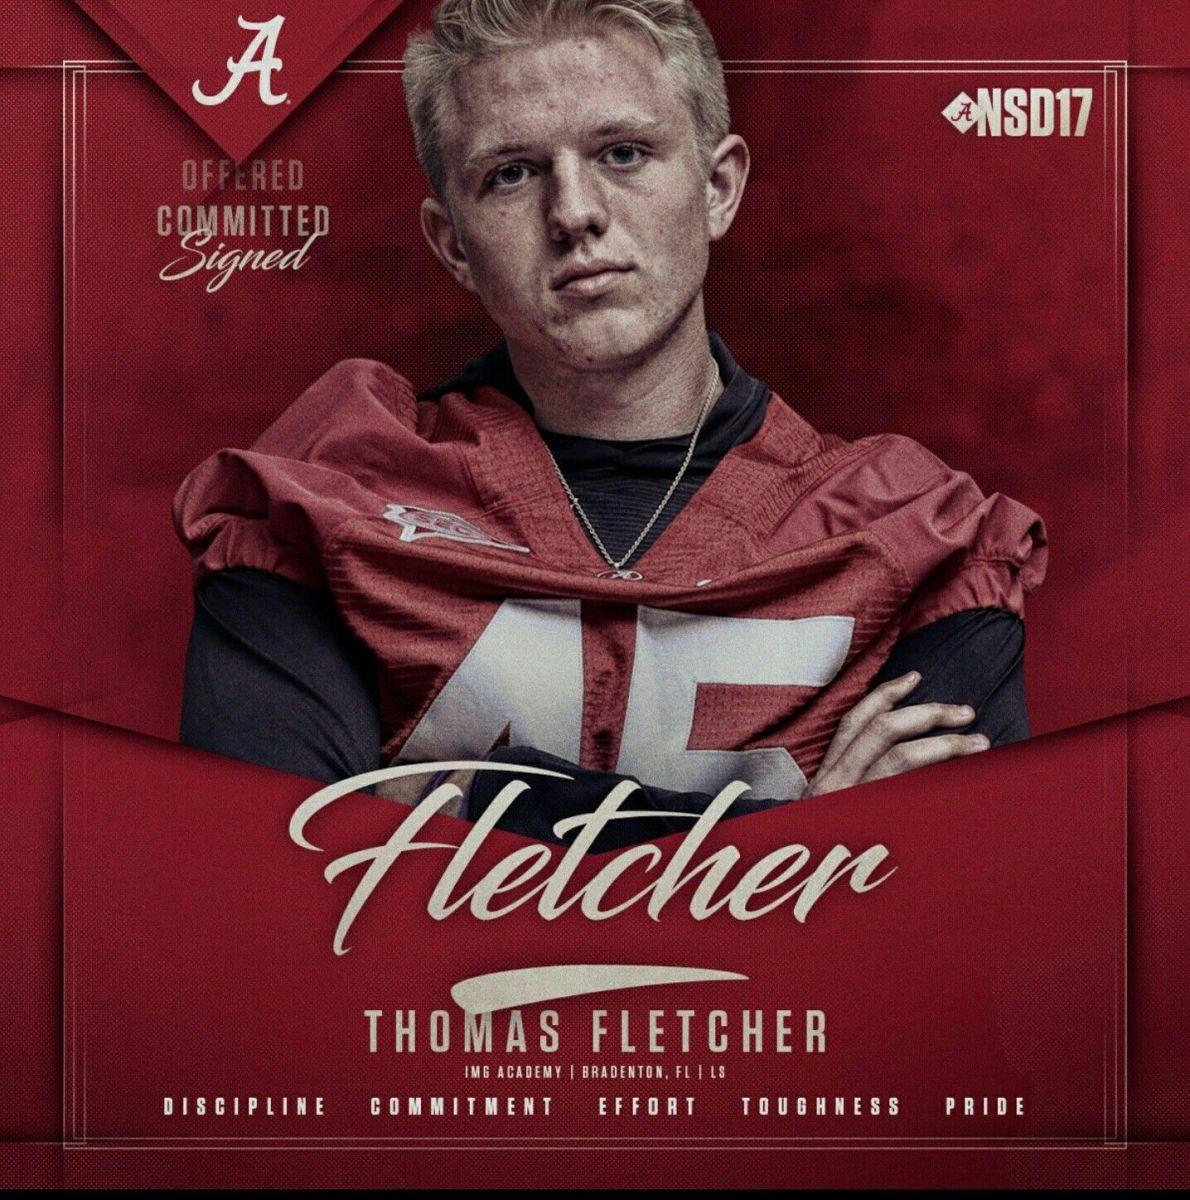 Alabama long-snapper Thomas Fletcher as a recruit